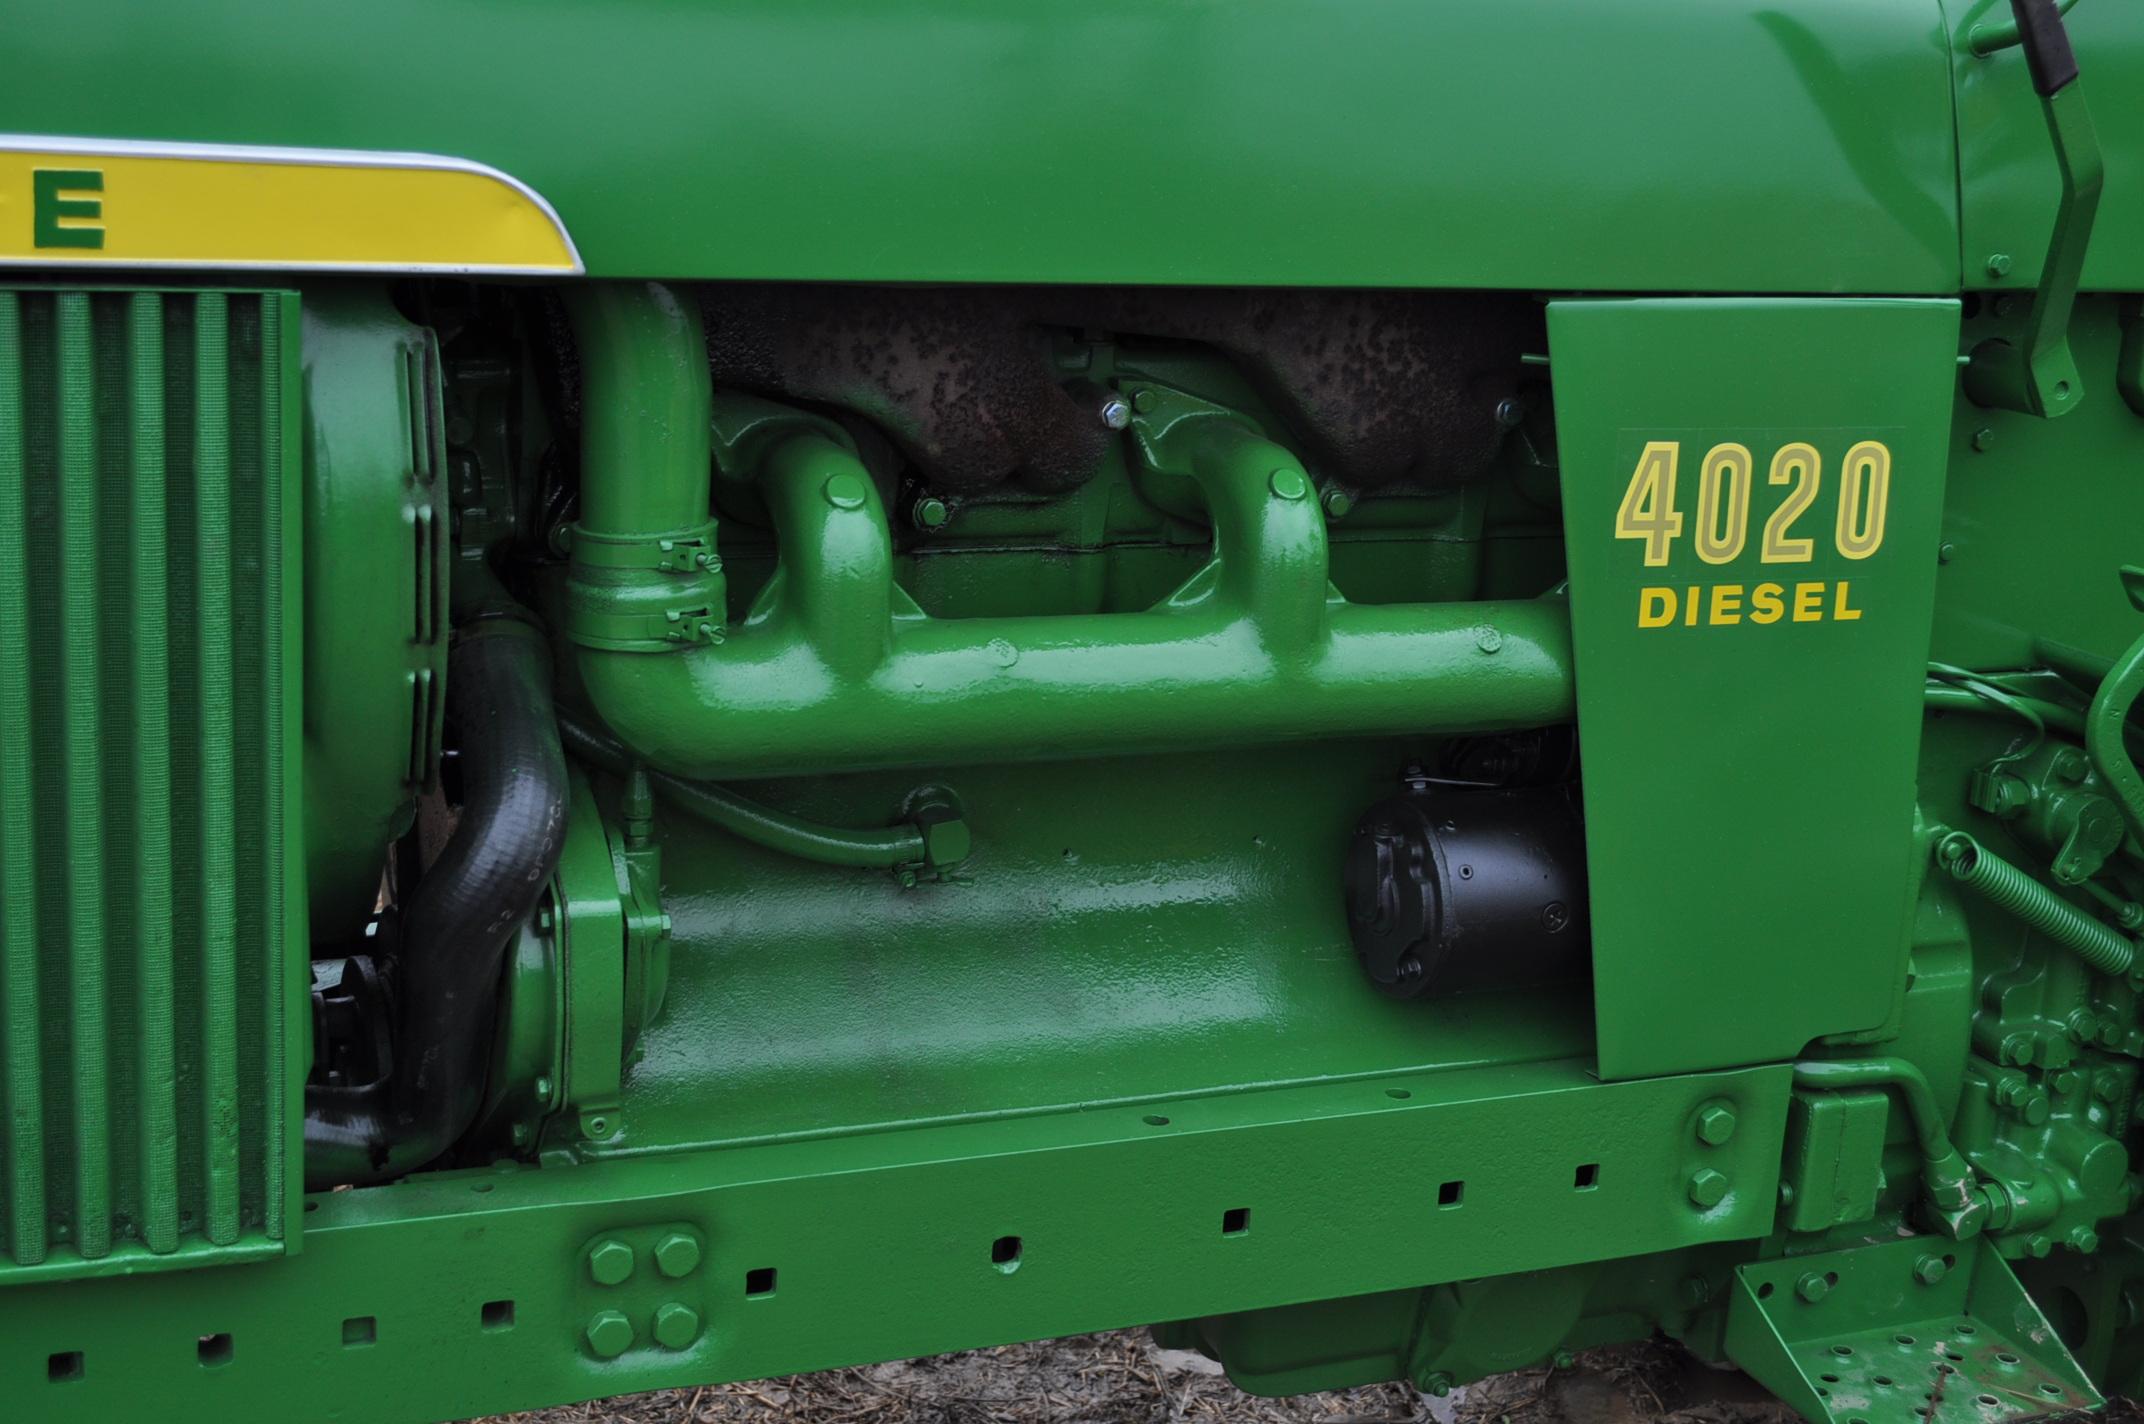 John Deere 4020 powershift, major overhaul on motor, 12V system, dual hyd remotes, wide front, 7,130 - Image 11 of 18